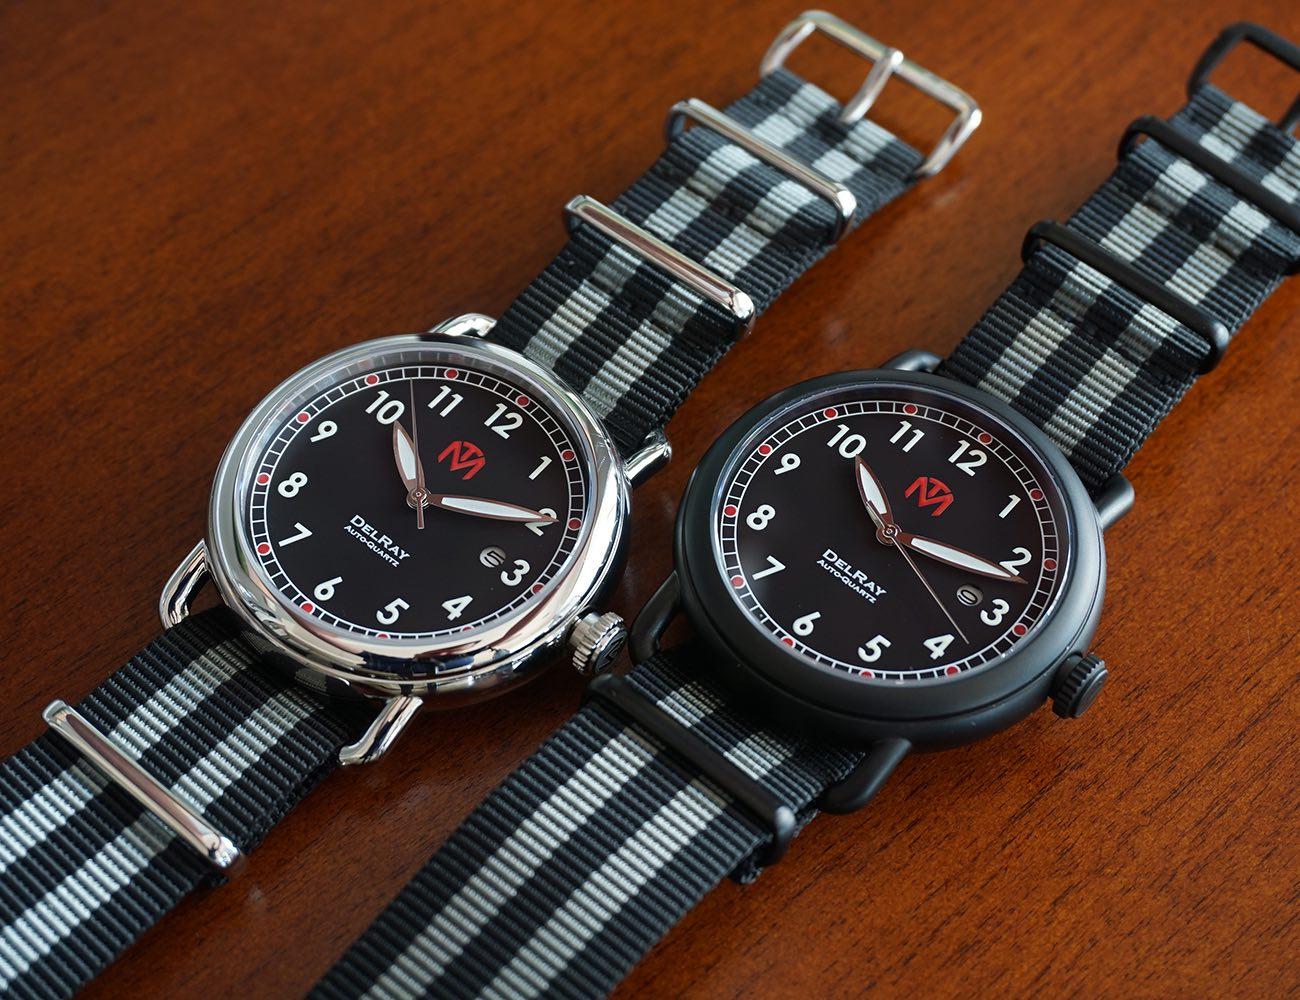 McDowell Time DelRay Auto-Quartz Watch